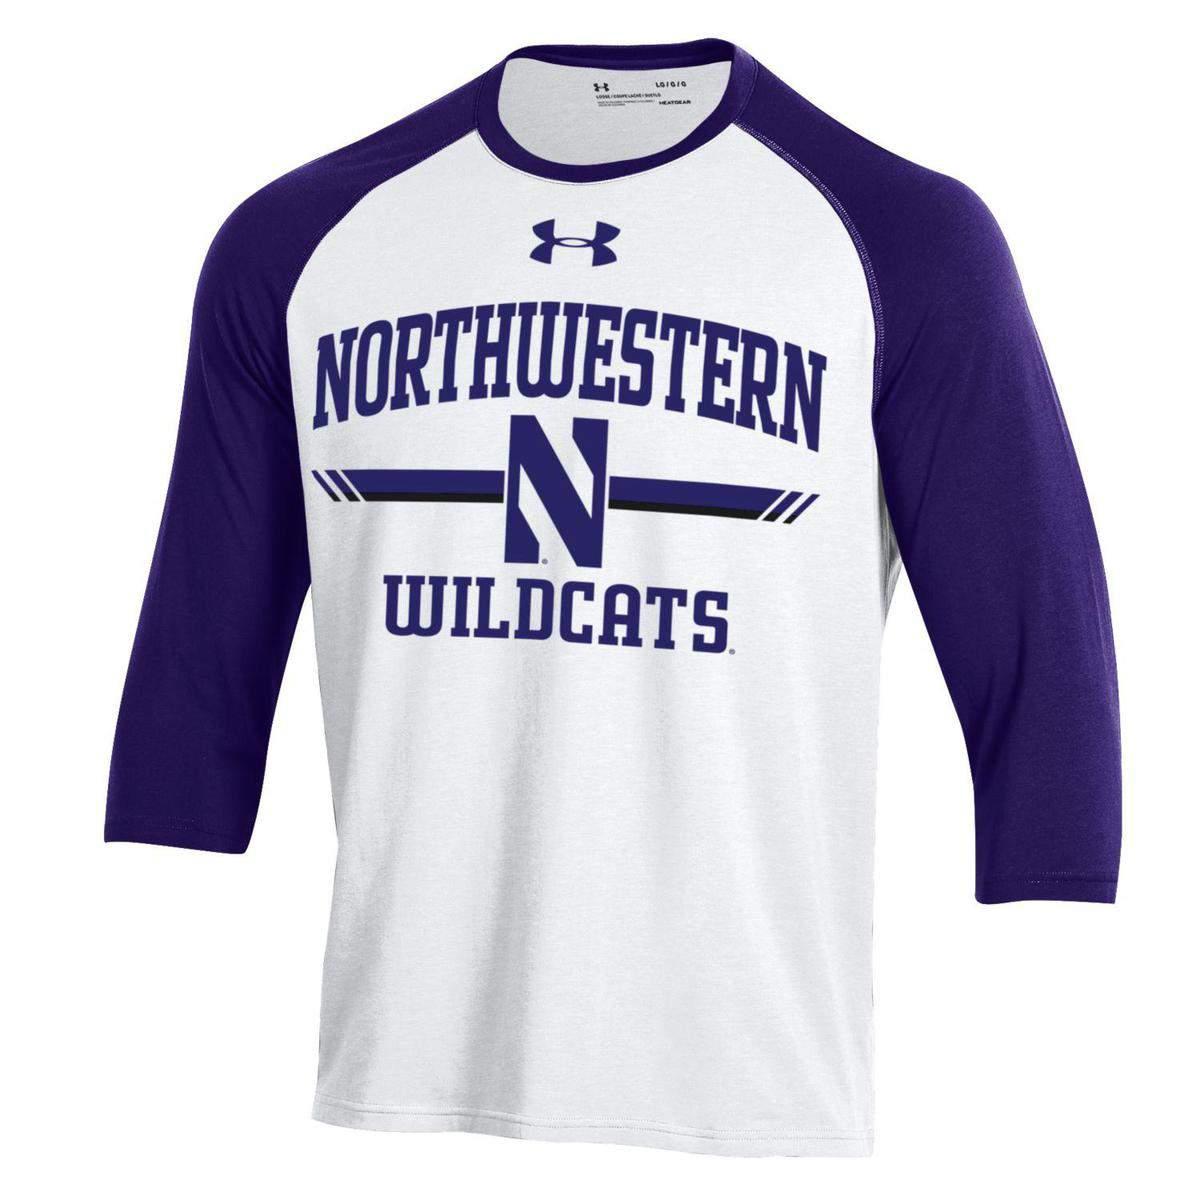 53f823b3f Northwestern University Wildcats Men's Under Armour Free Style Half Sleeve  Purple & White Baseball Tee